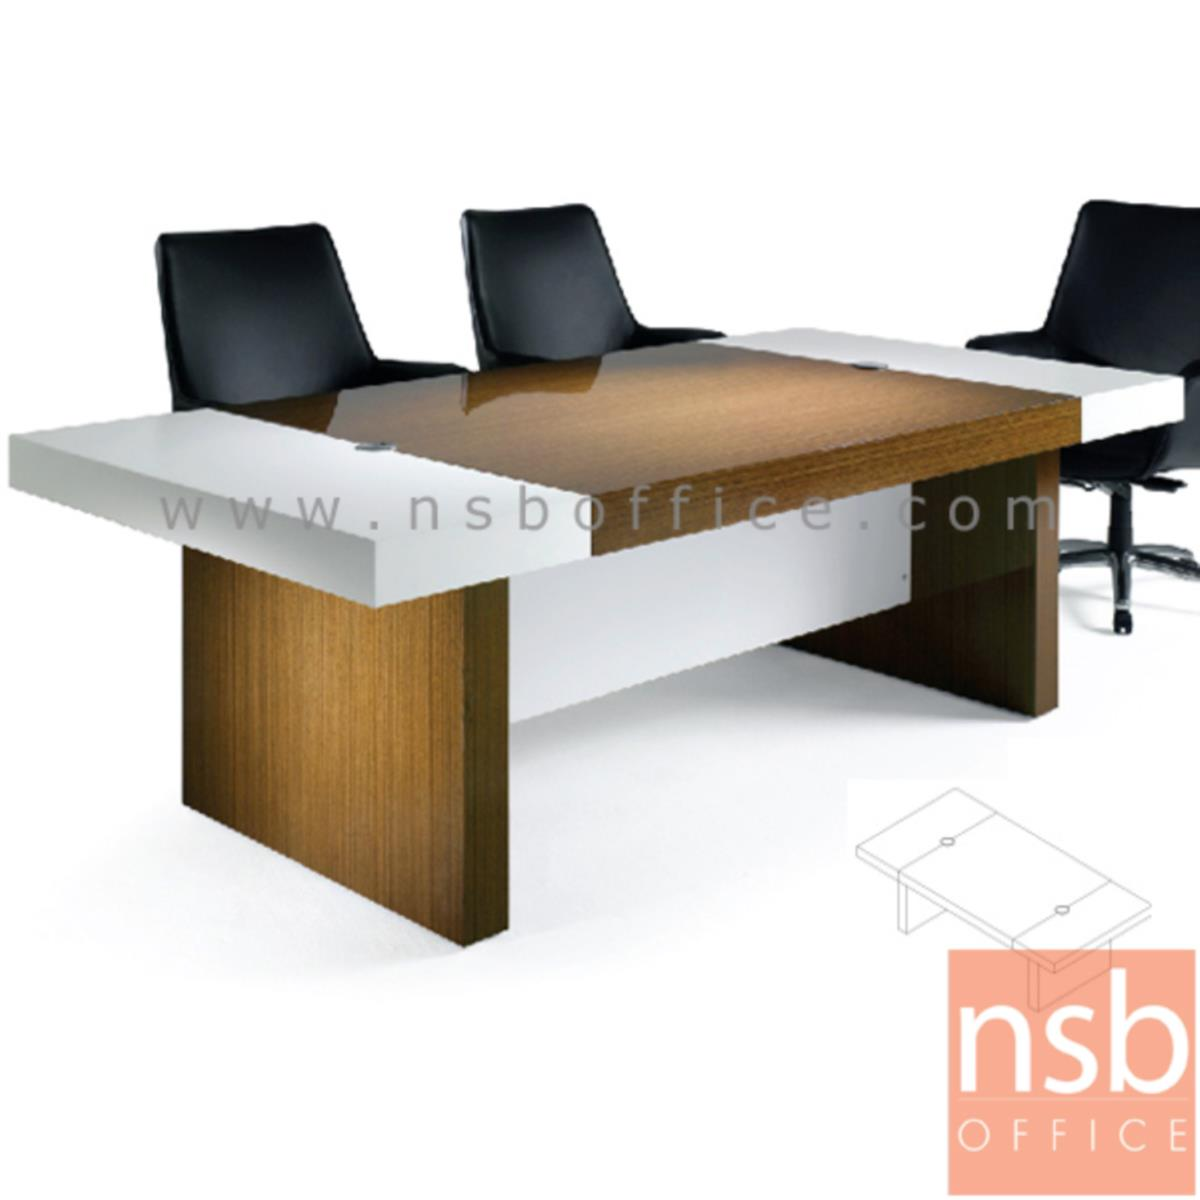 A05A155:โต๊ะประชุมทรงสี่เหลี่ยม  รุ่น Montel (มอนเทล) ขนาด 240W cm.  มีช่องร้อยสายไฟ สินค้ารอผลิต 30 วัน